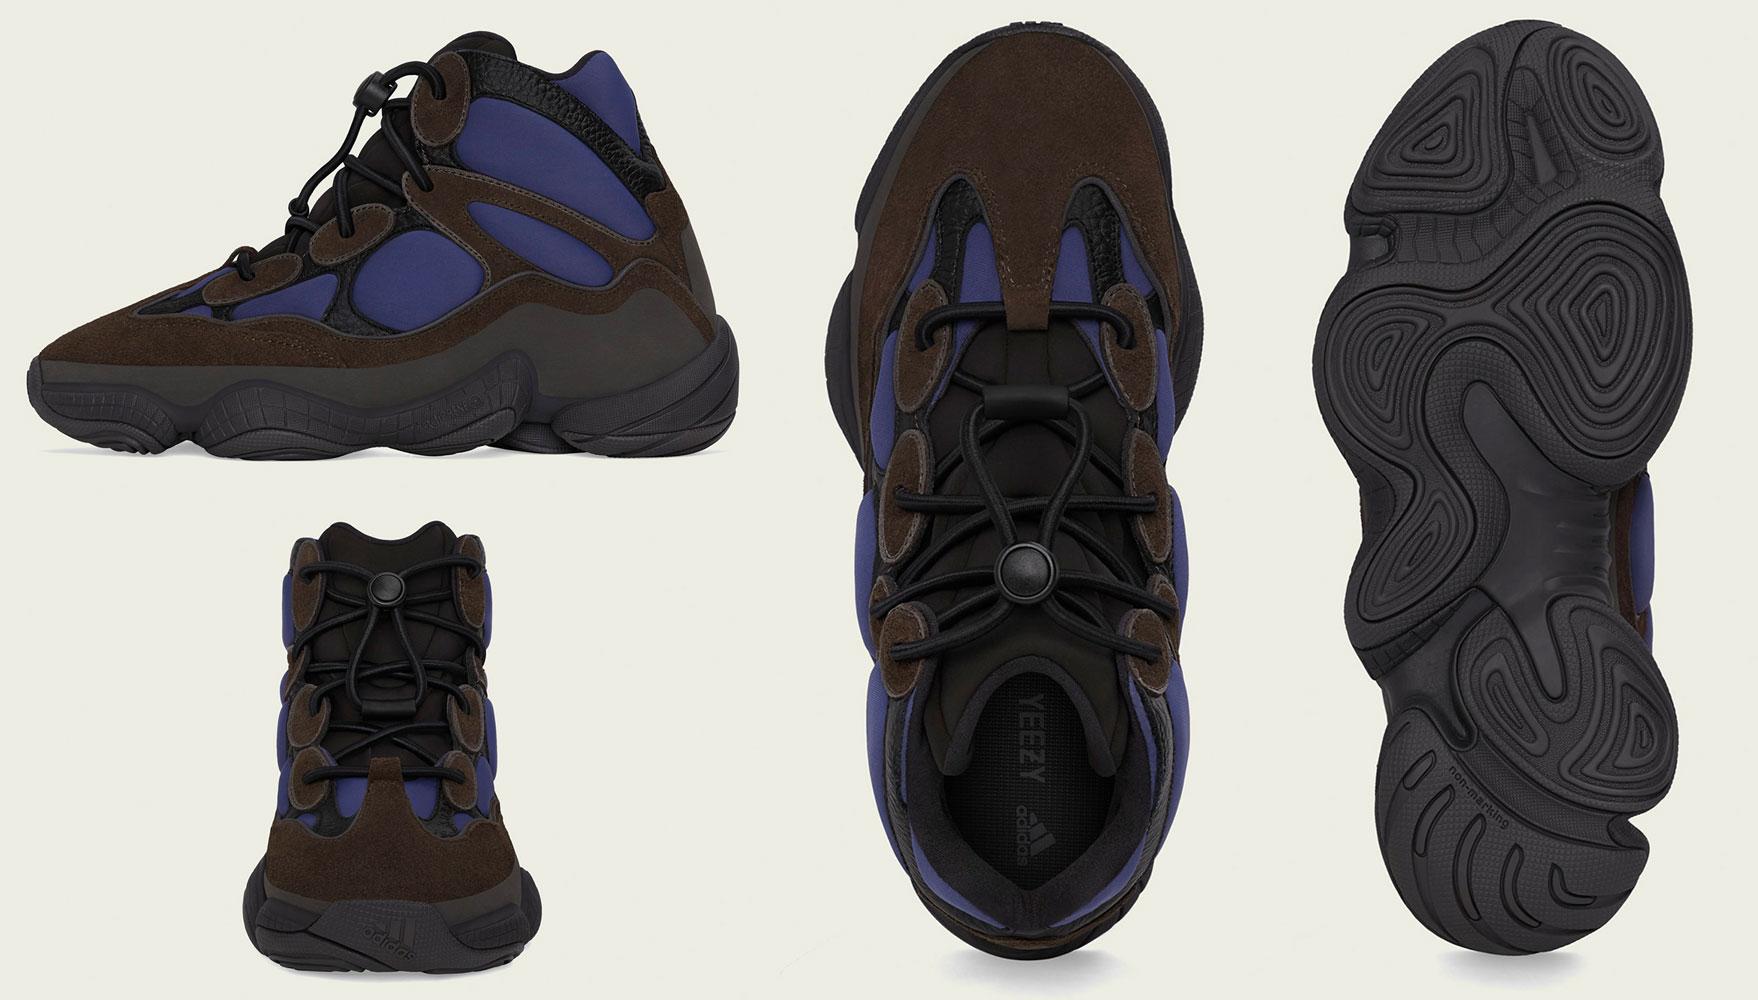 where-to-buy-adidas-yeezy-500-high-tyrian